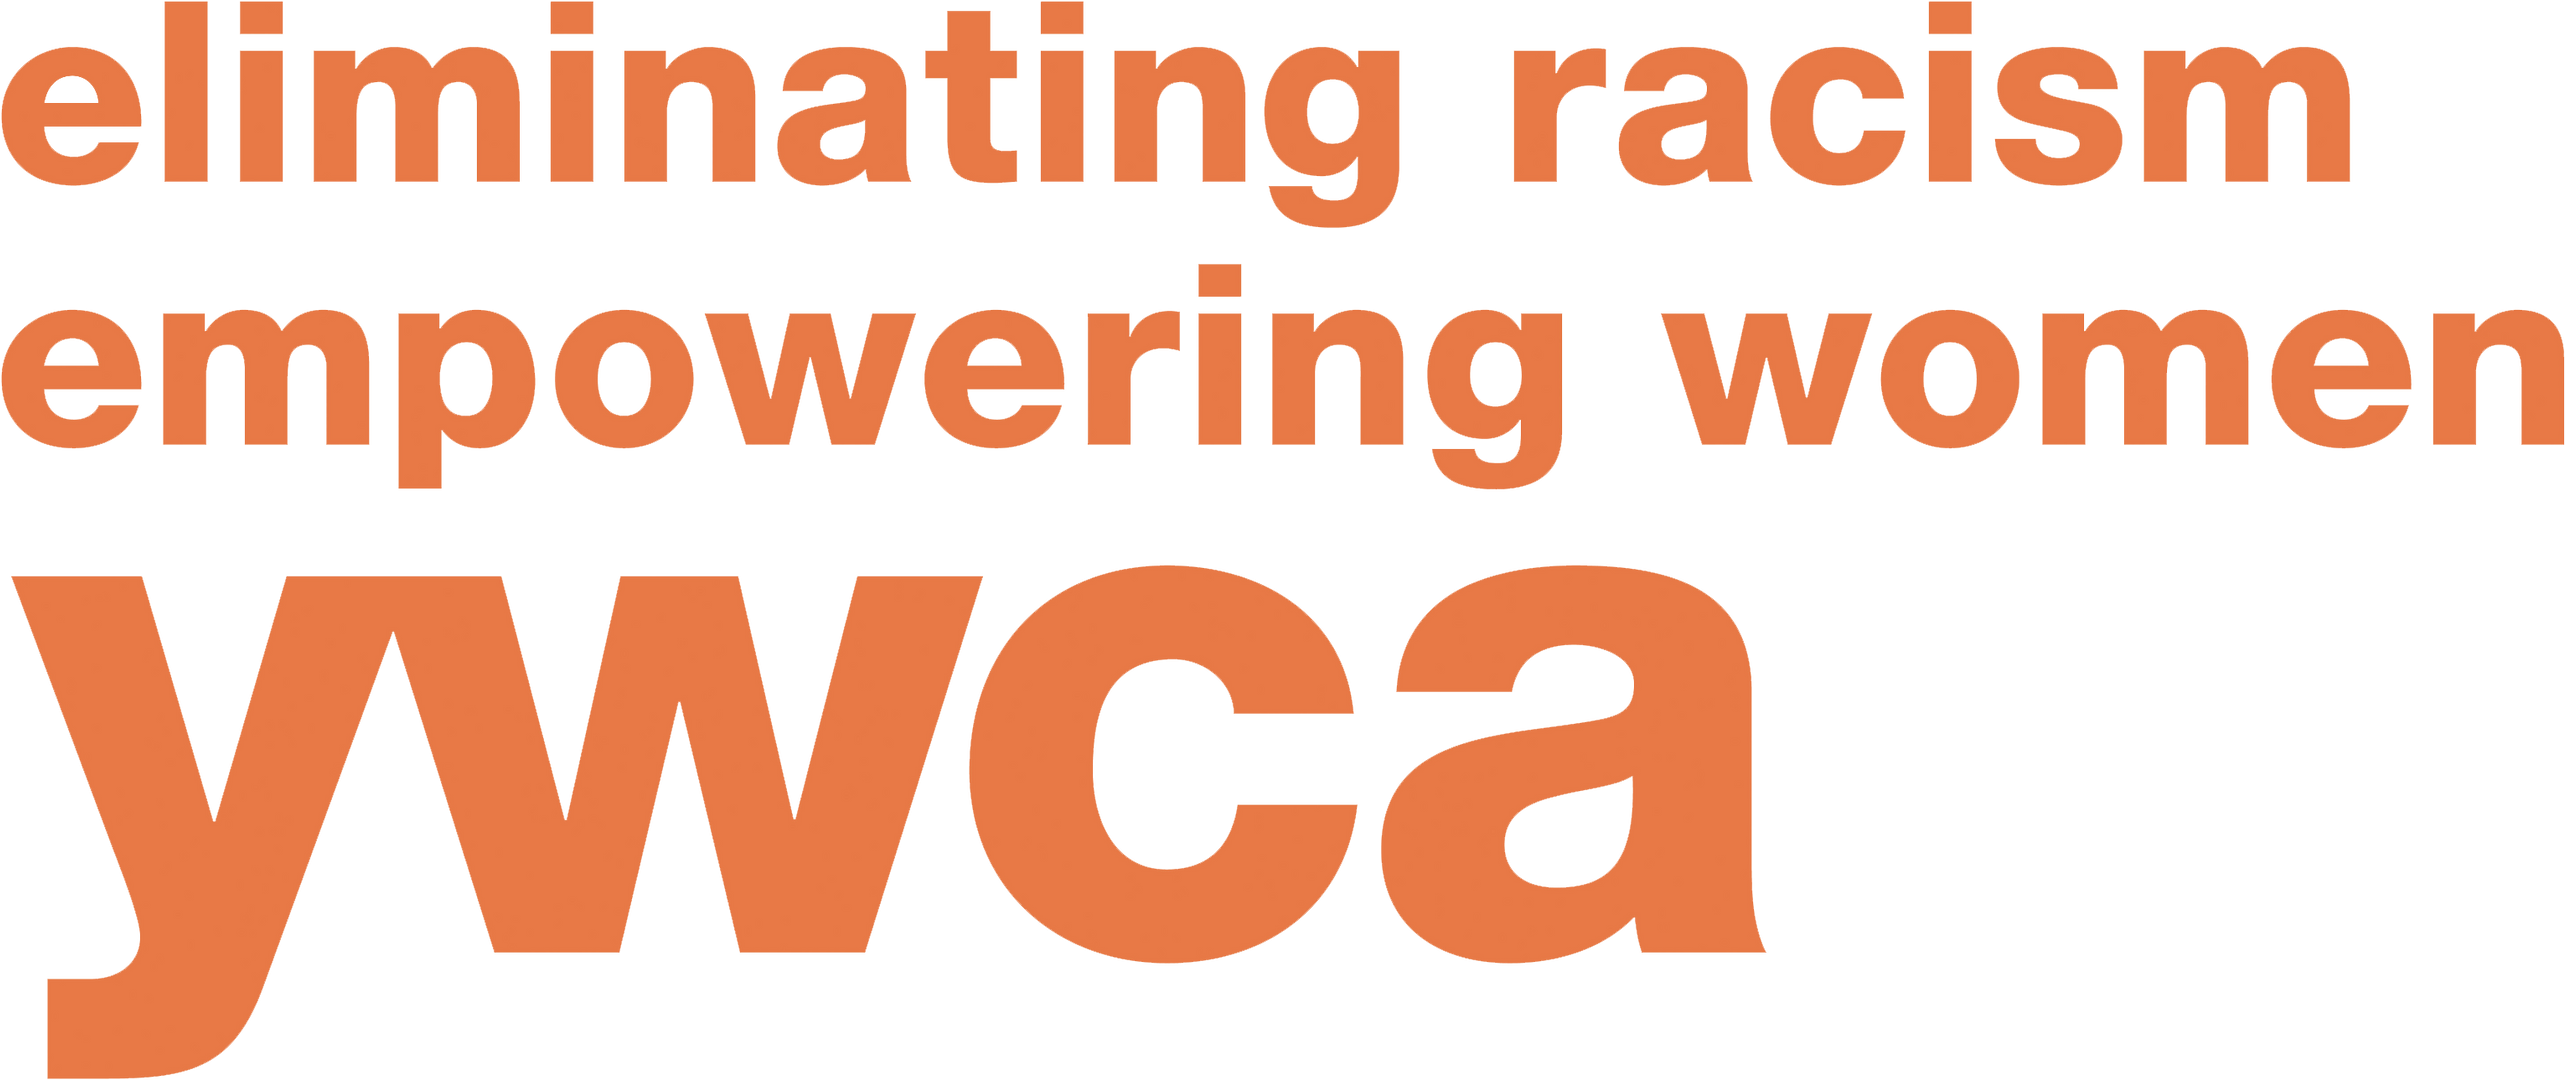 YWCA.png